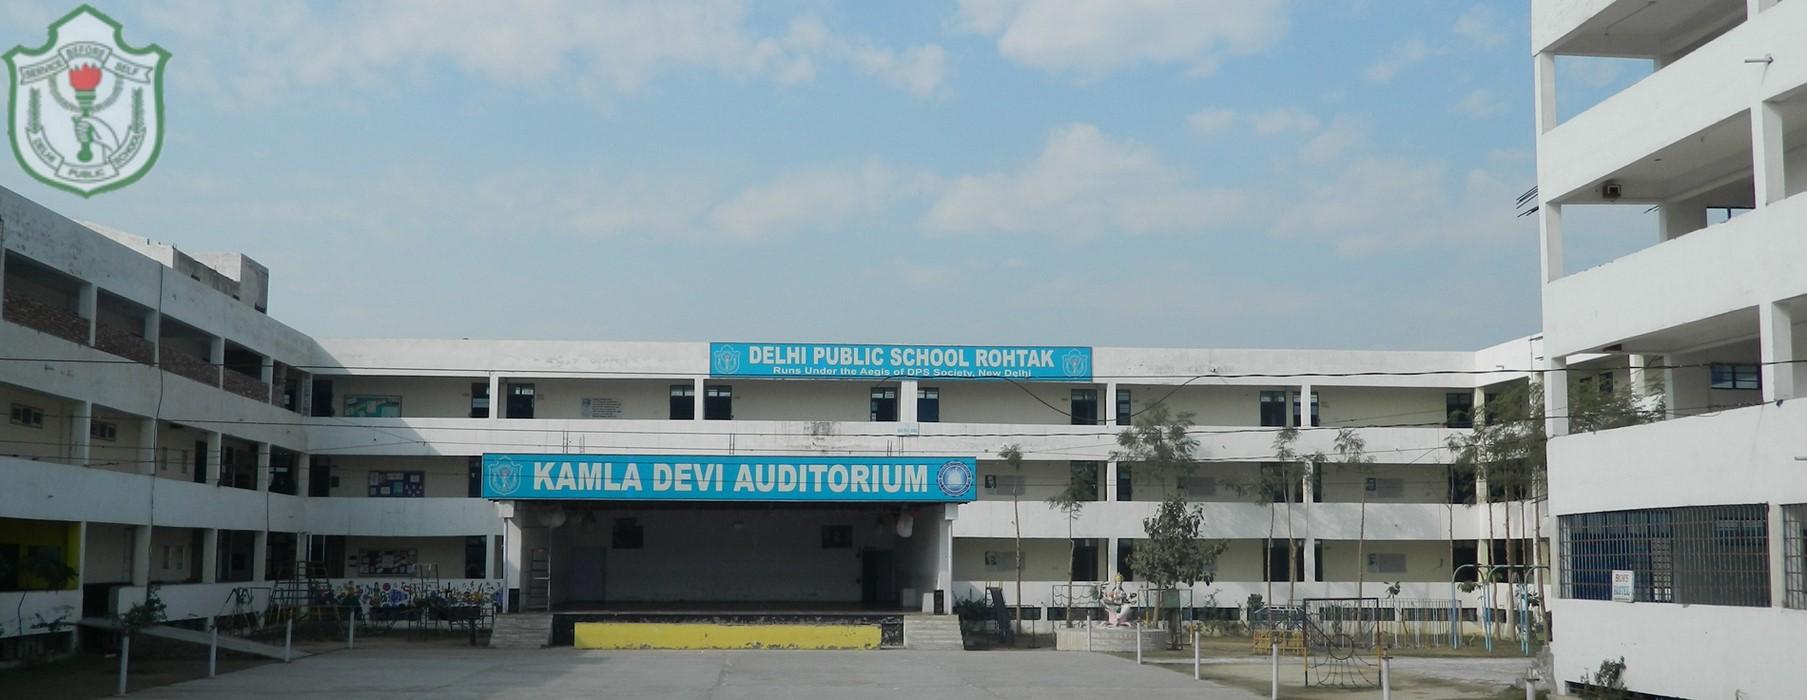 Delhi Public School Rohtak - Haryana Admission Open